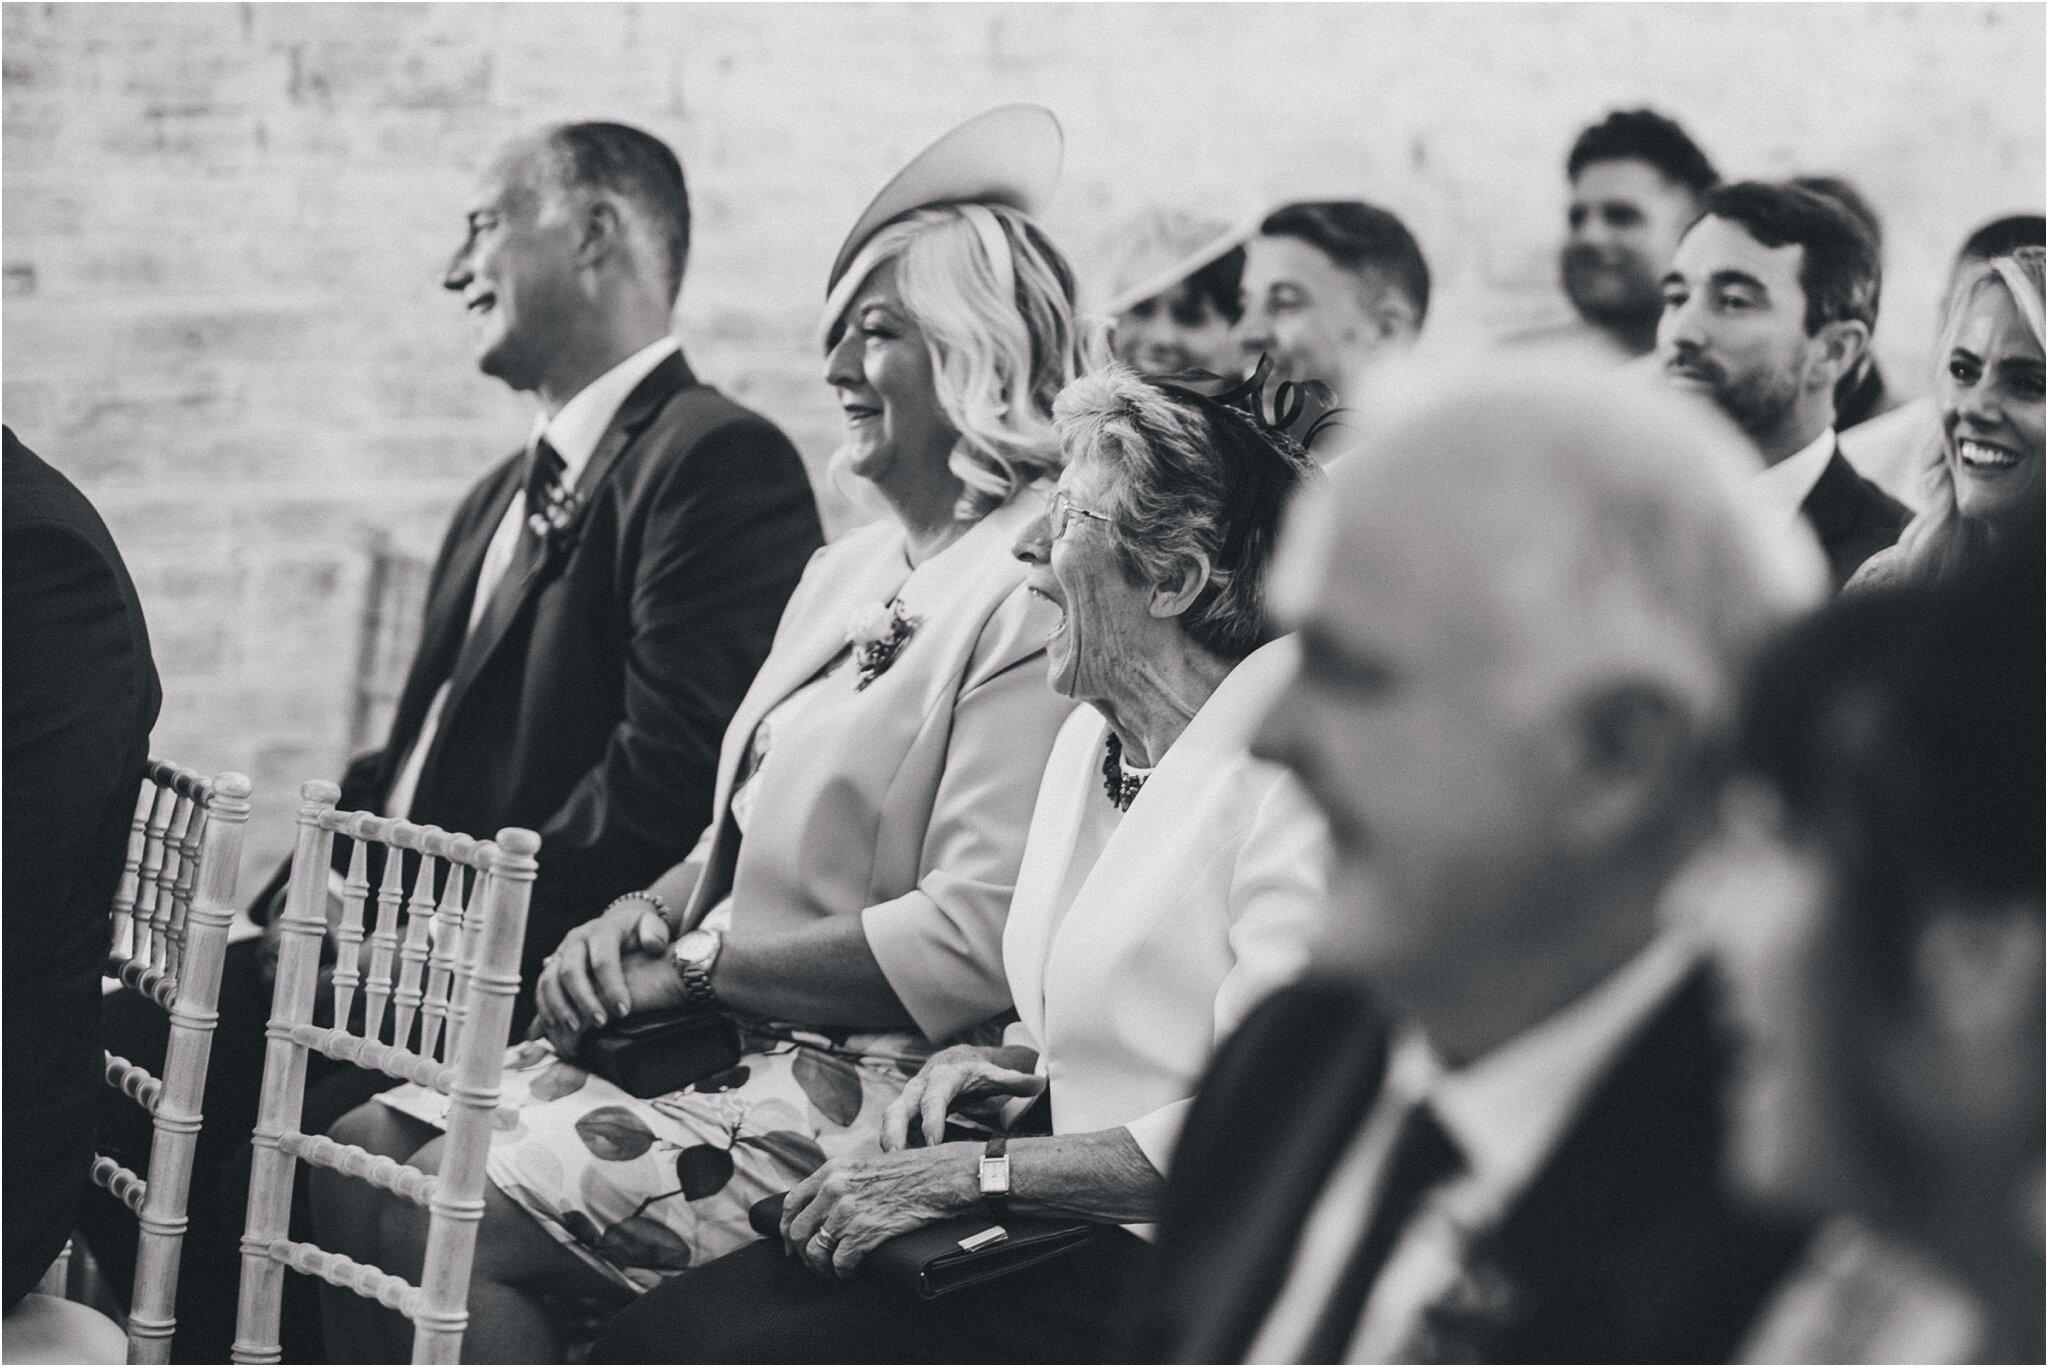 Dorfold Hall marquee wedding 00043.jpg